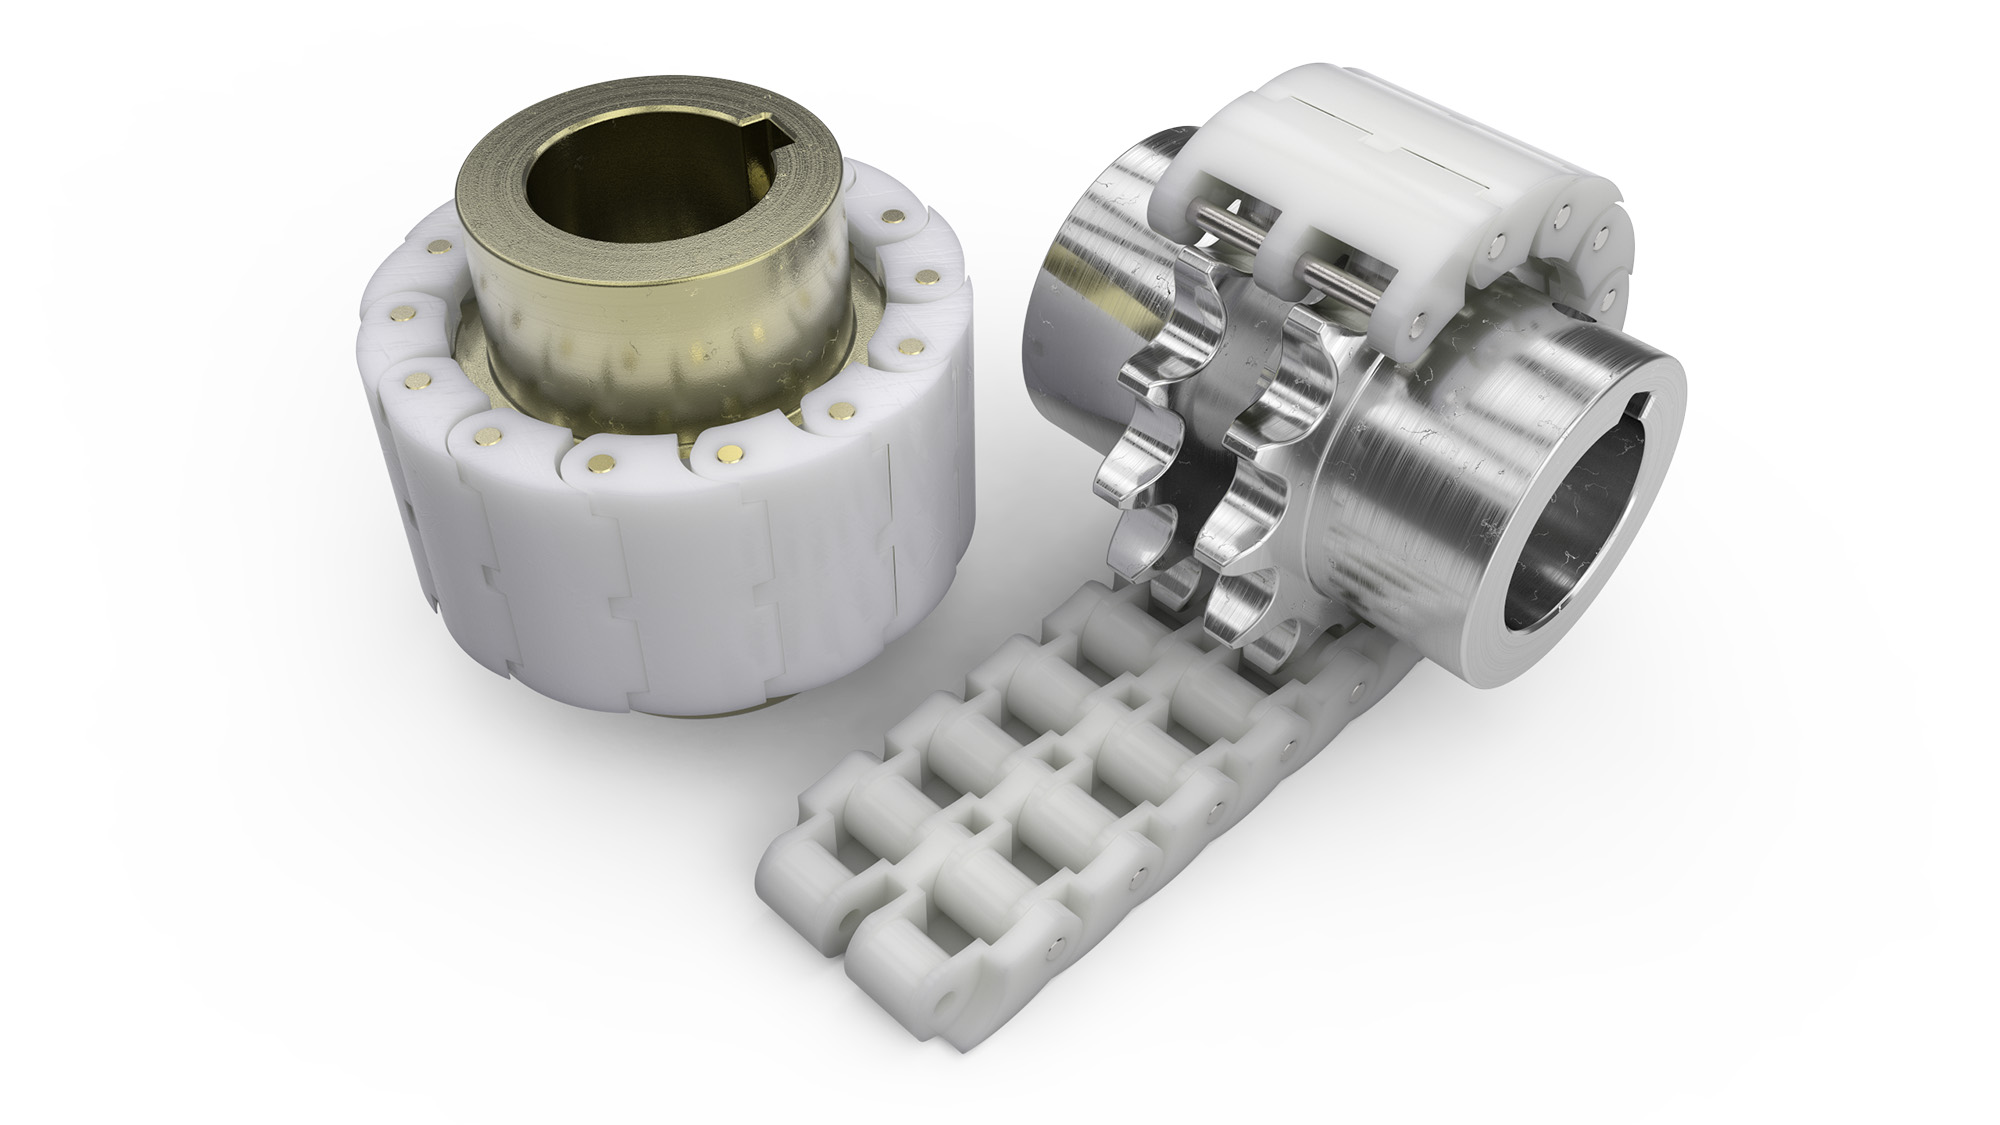 Plastic chain couplings dyno conveyors roller belt